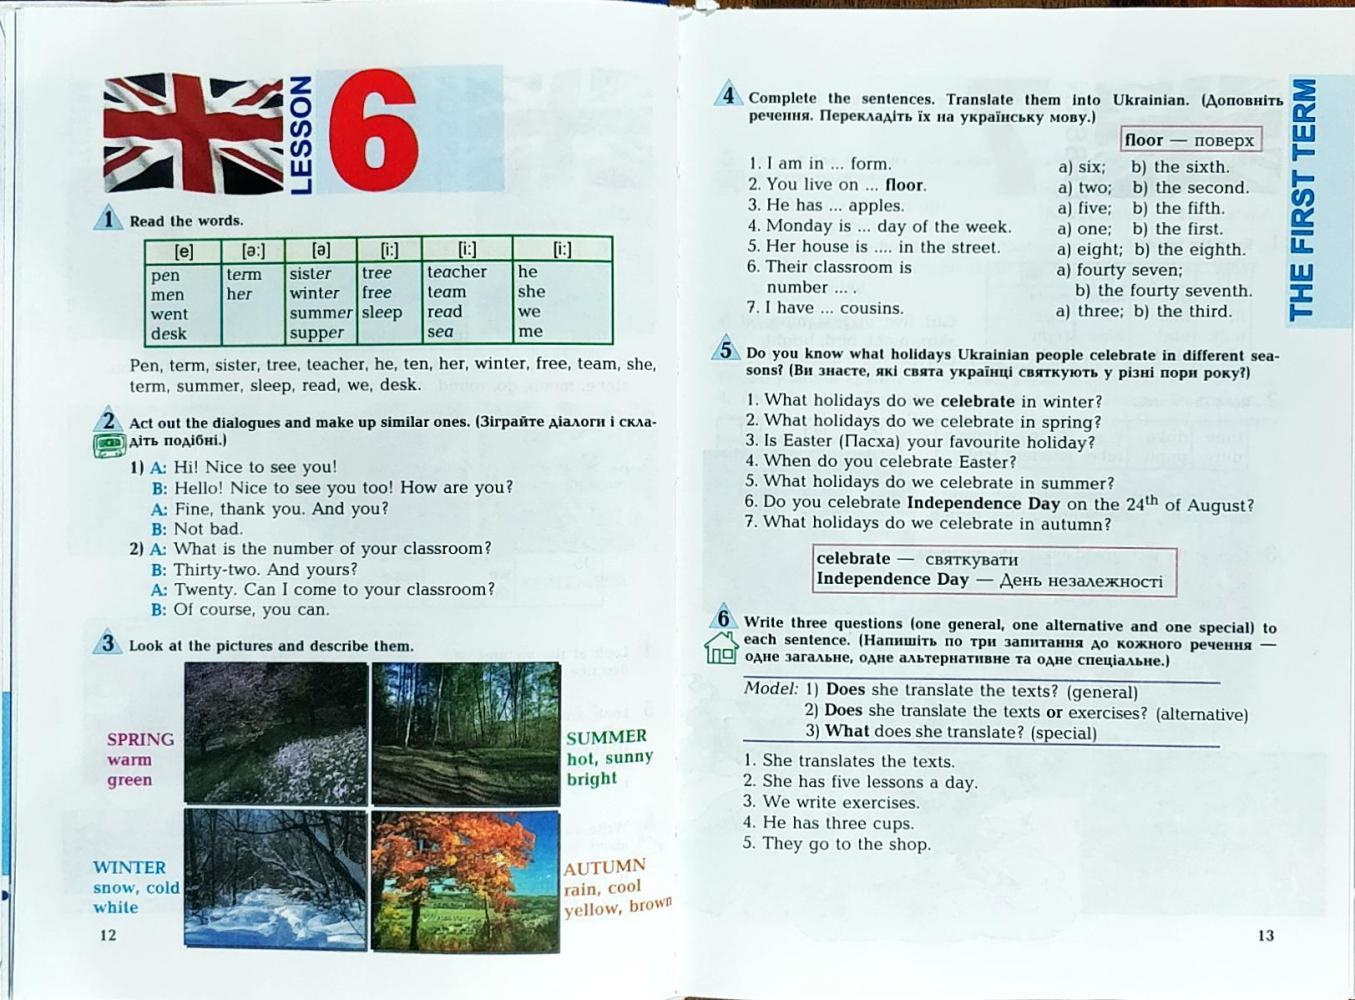 англйська мова 6 клас кучма морська гдз